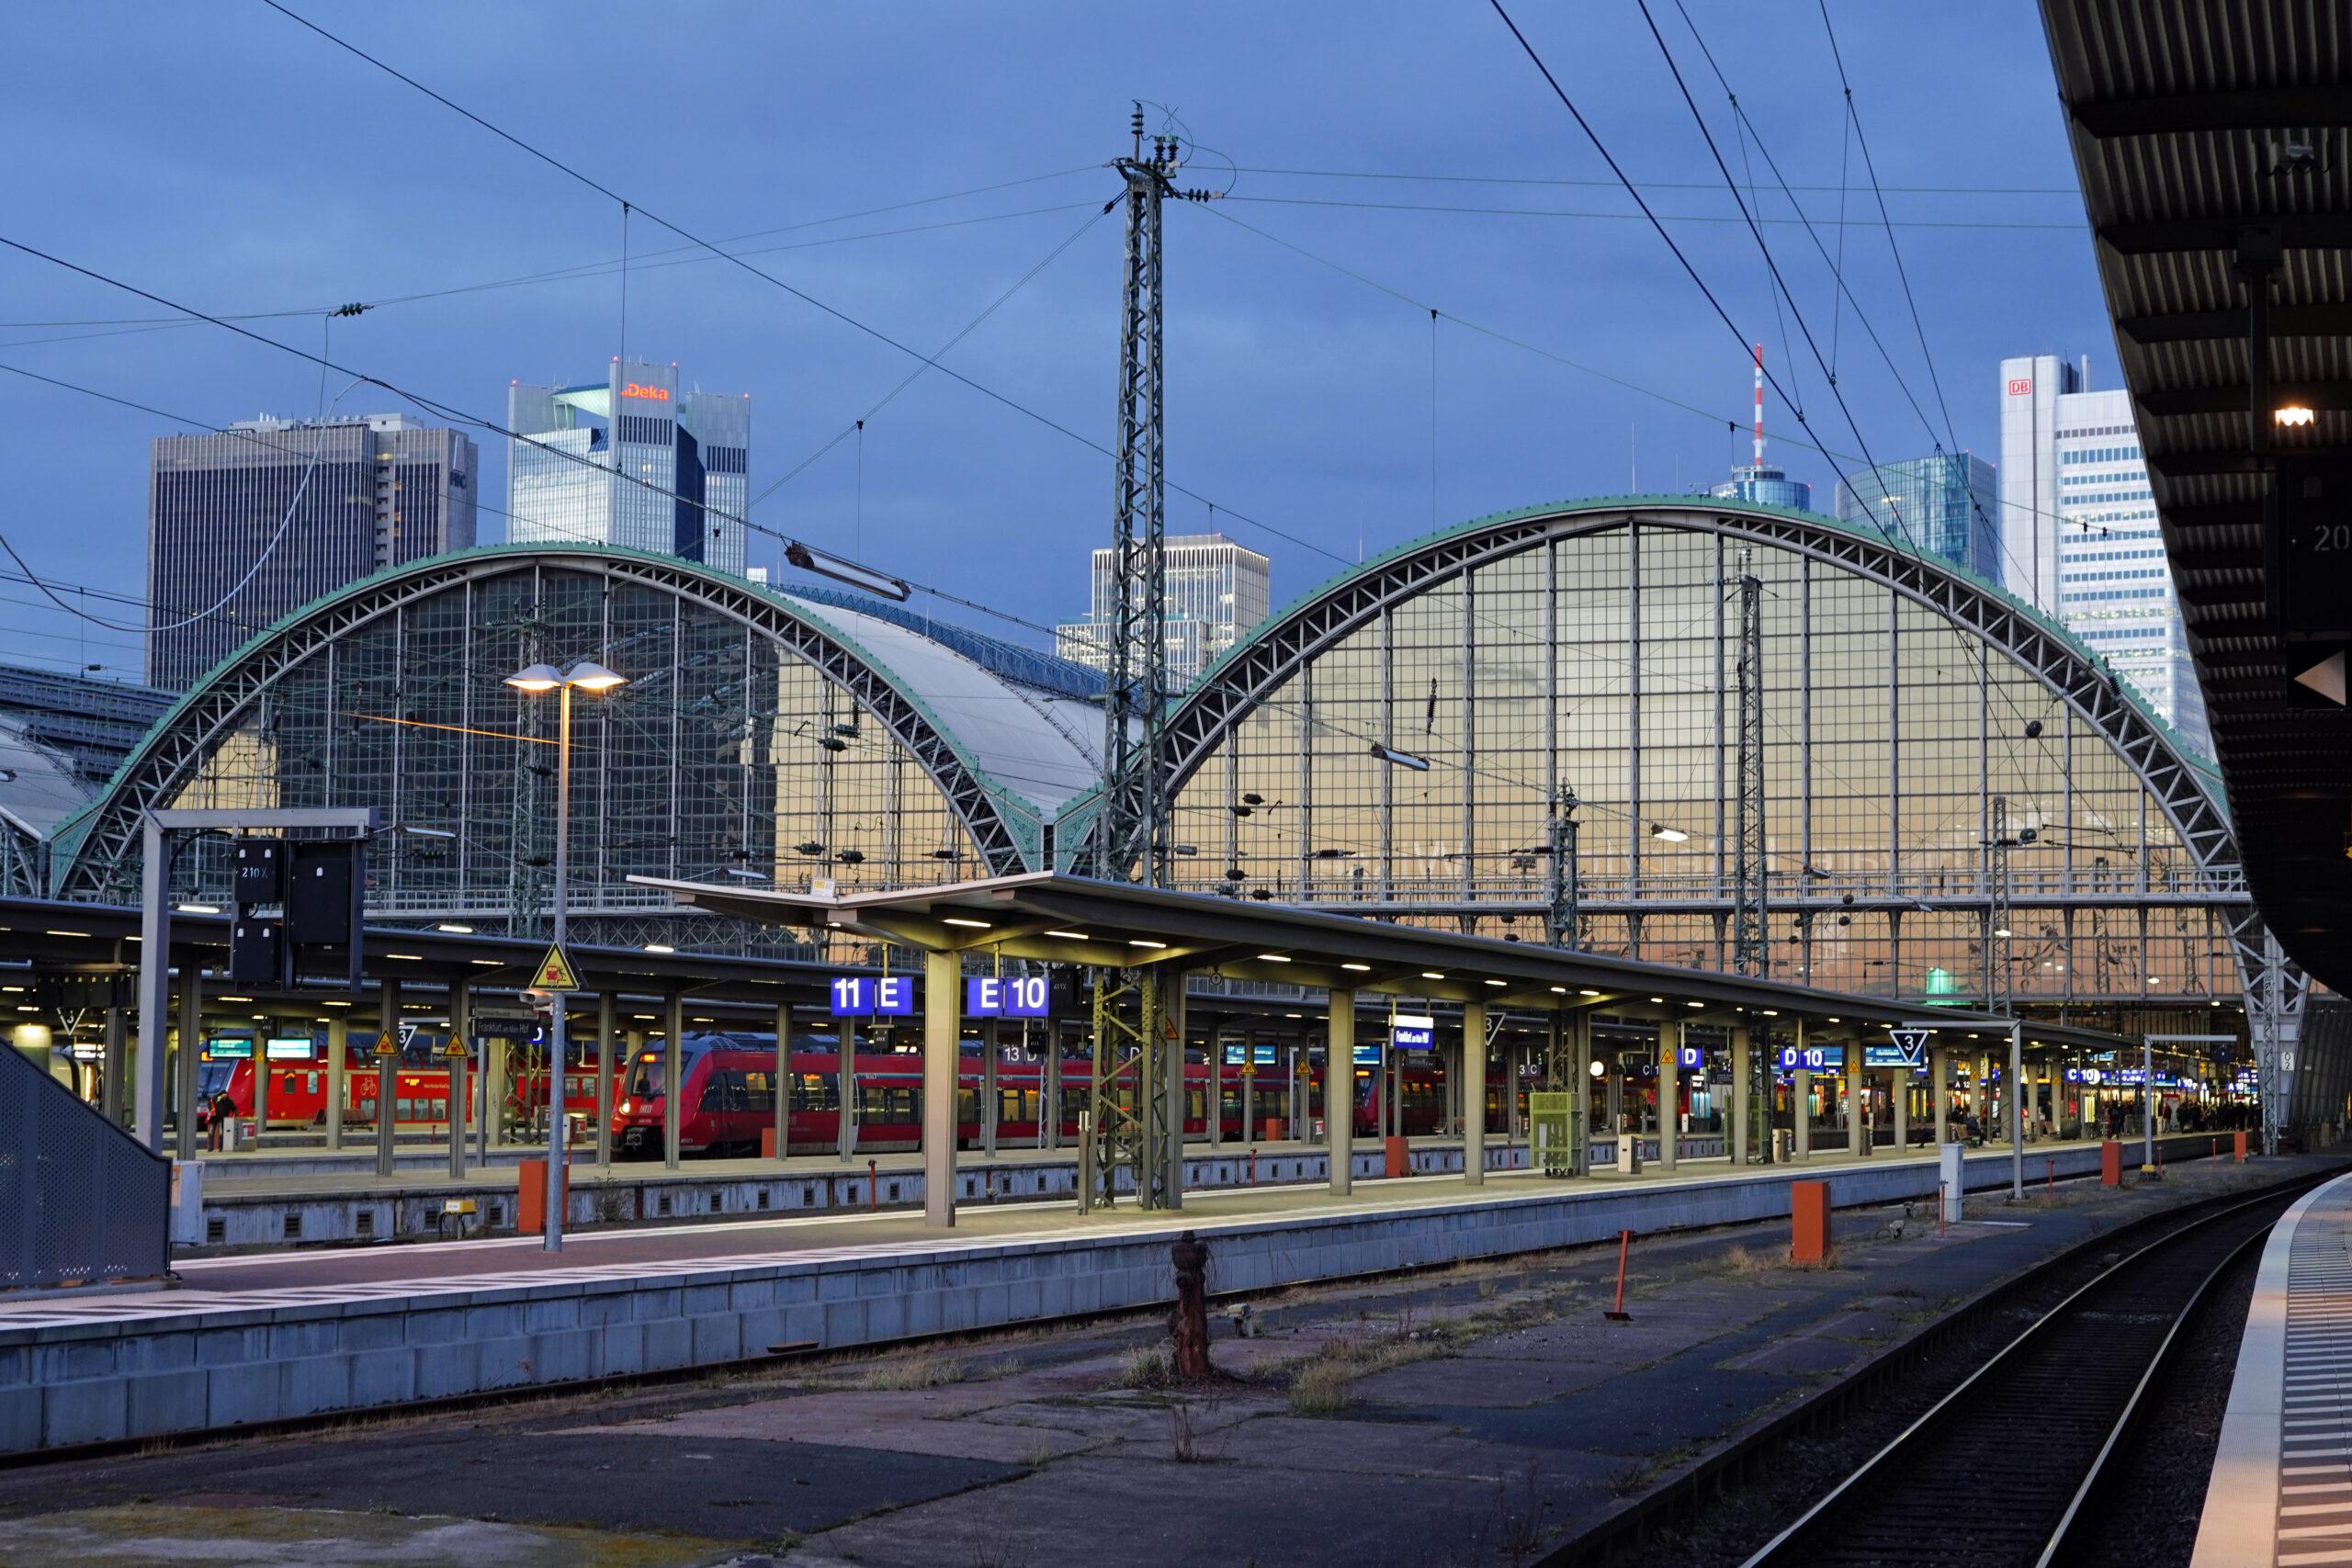 Frankfurt (Main) Hbf – Central Station